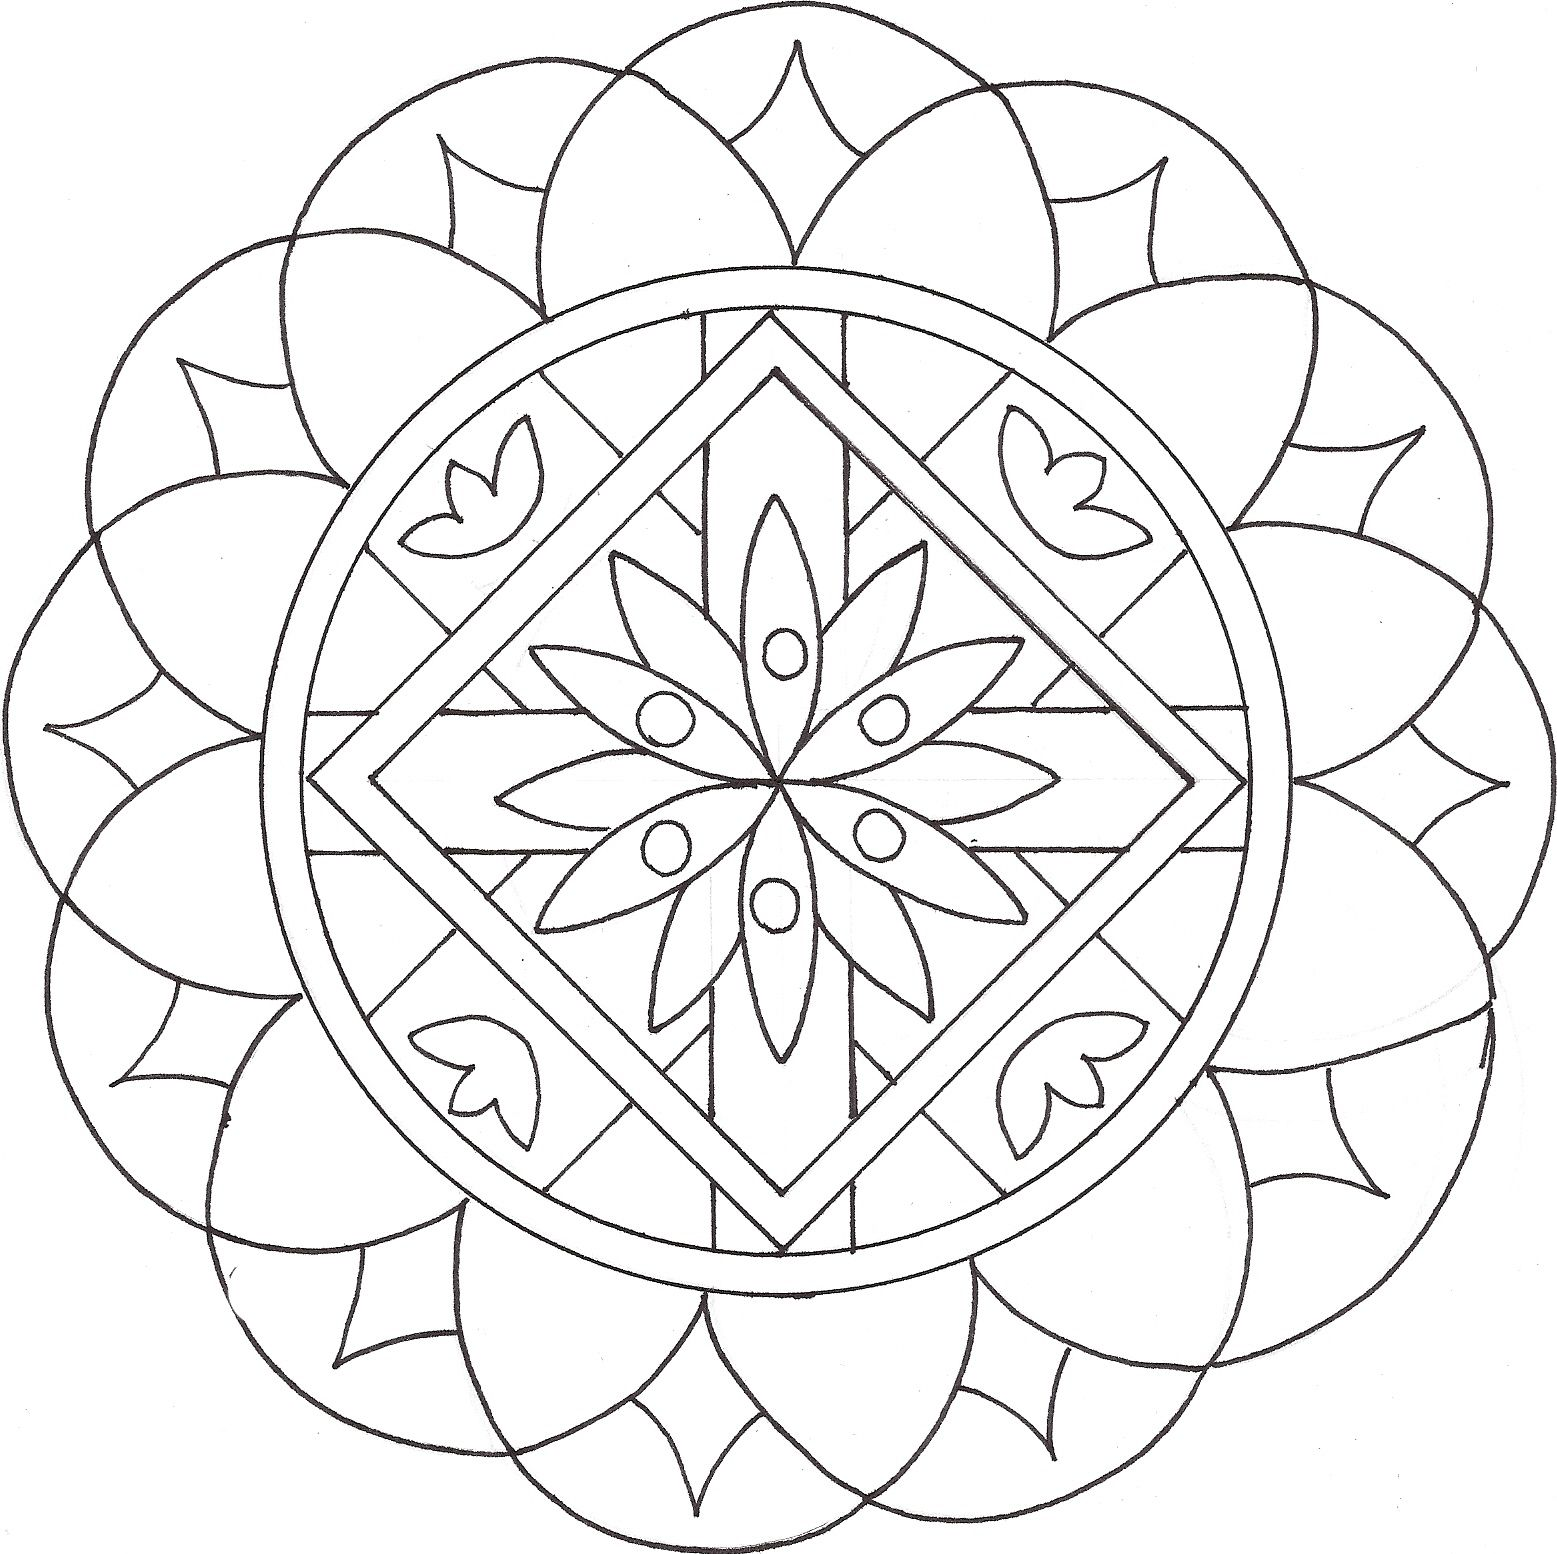 Dibujos Asimetricos Para Colorear